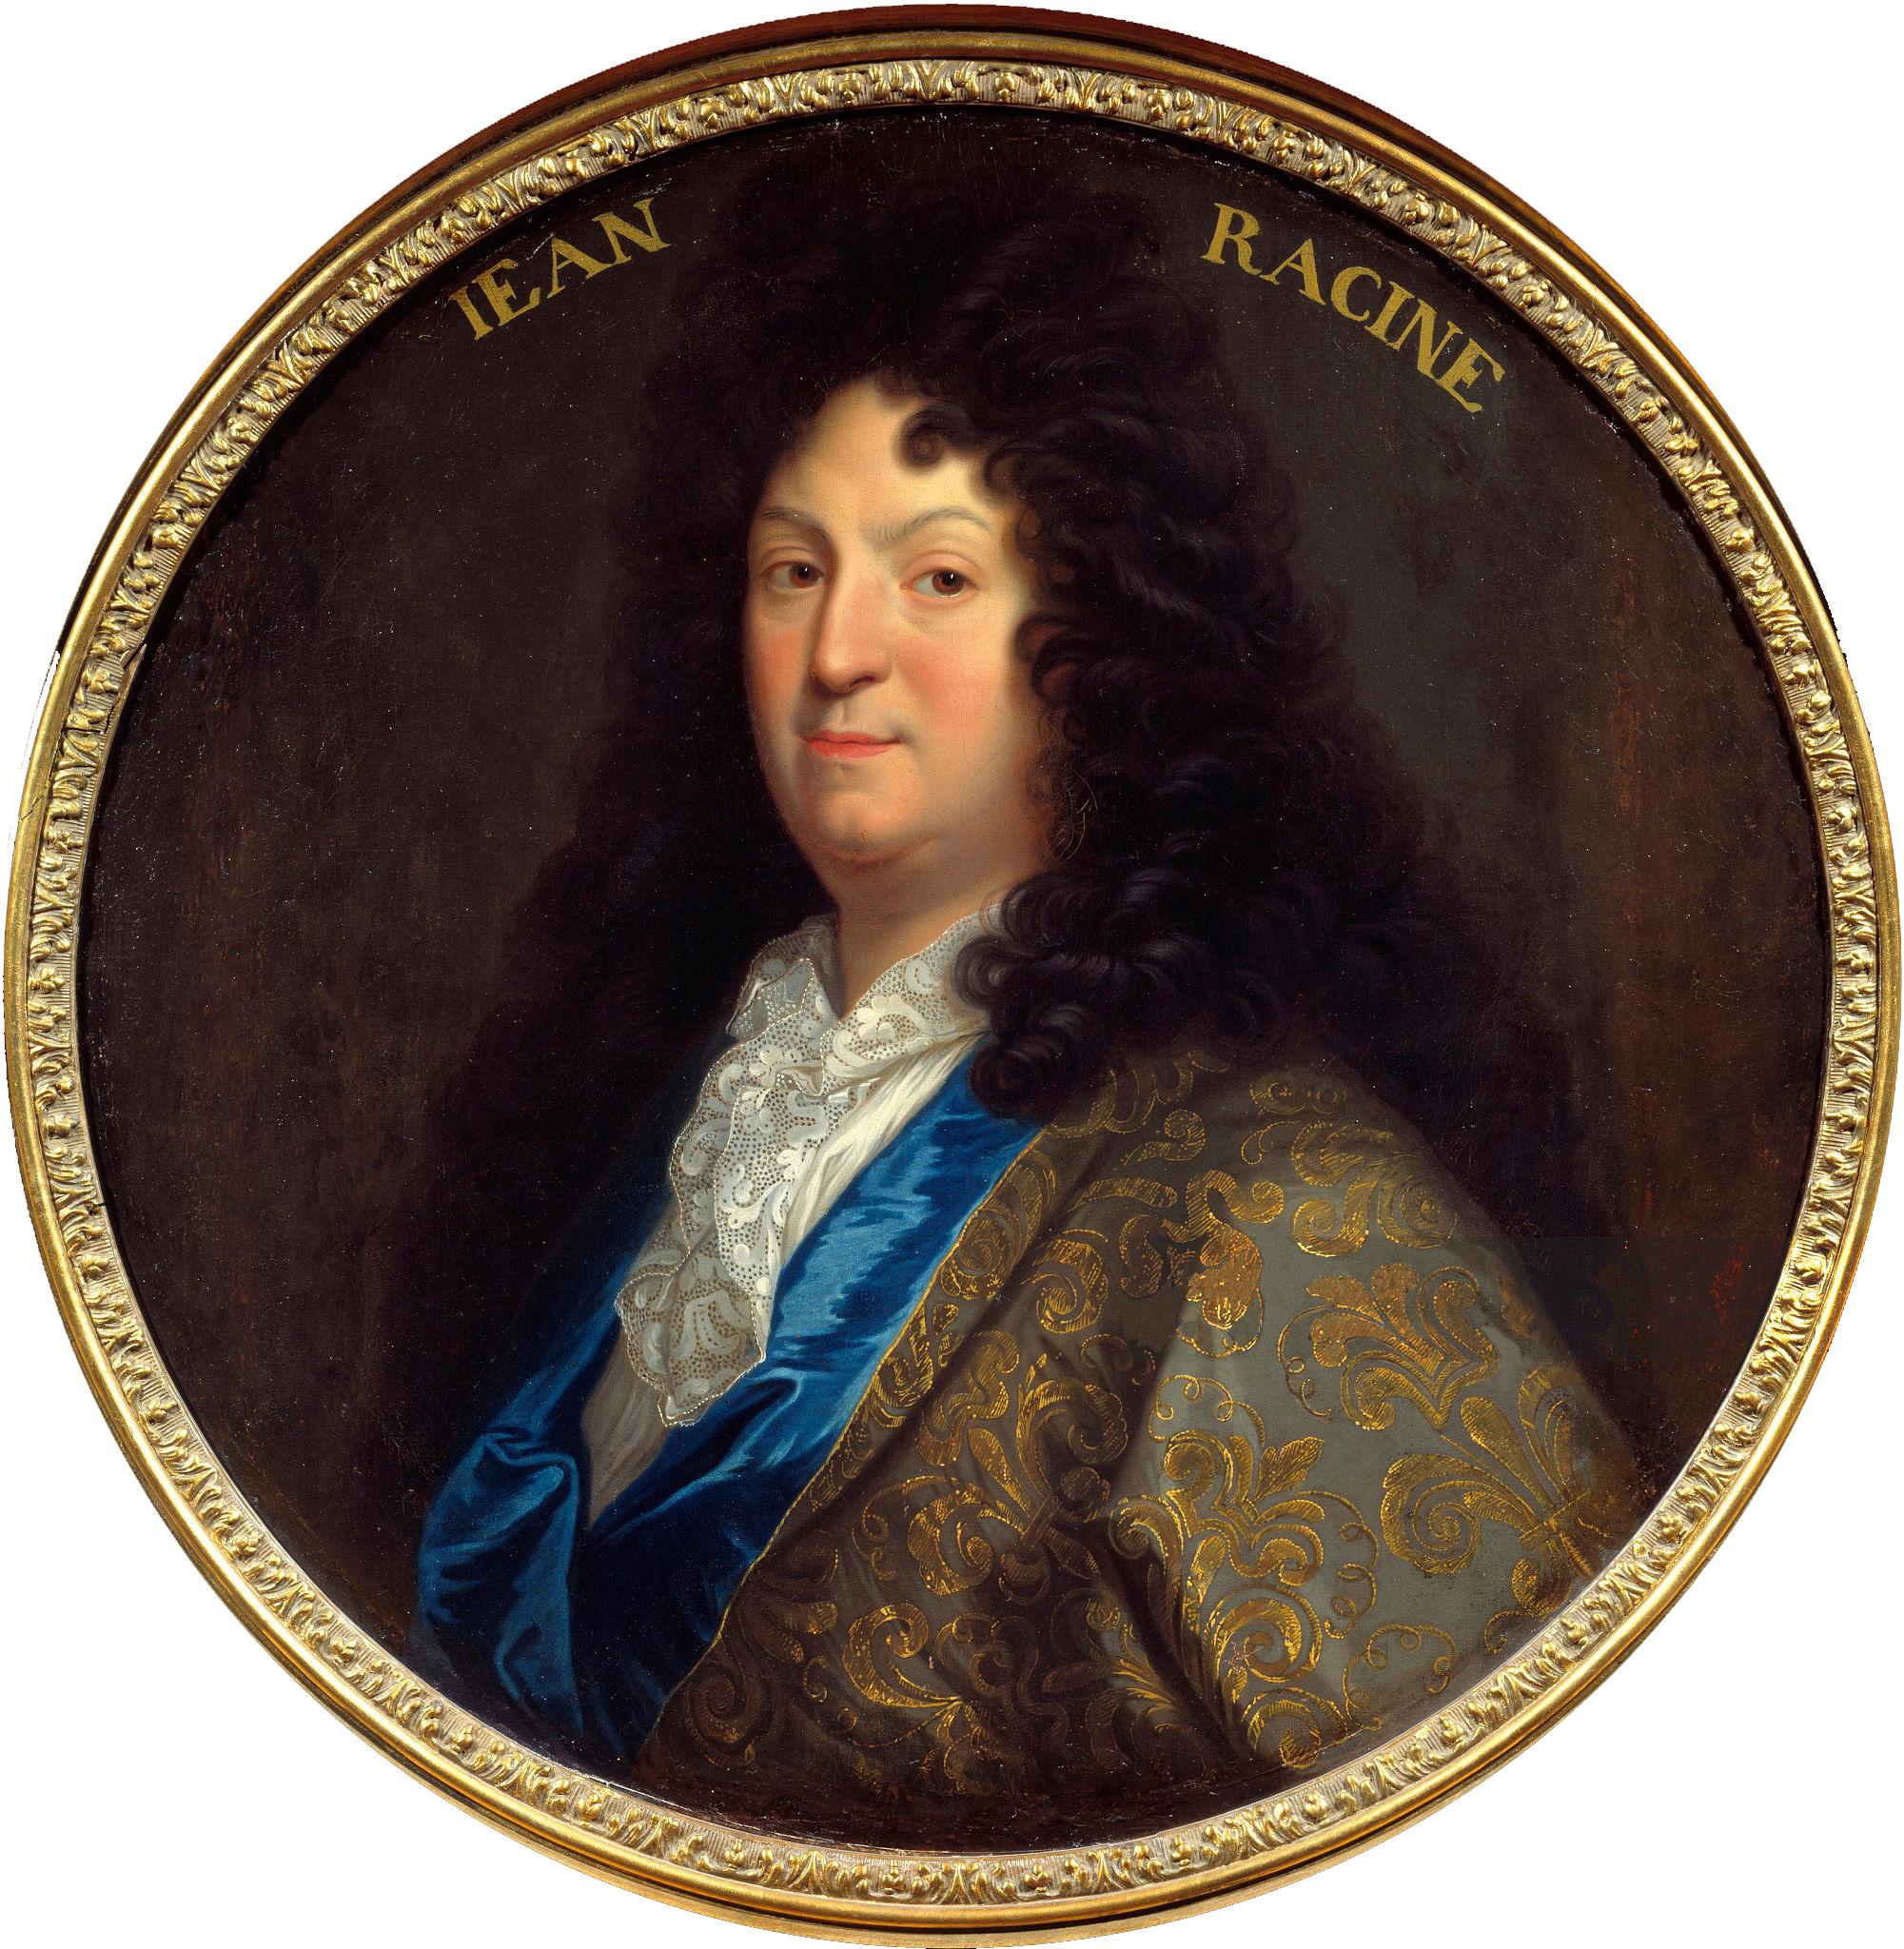 Portrait of Racine